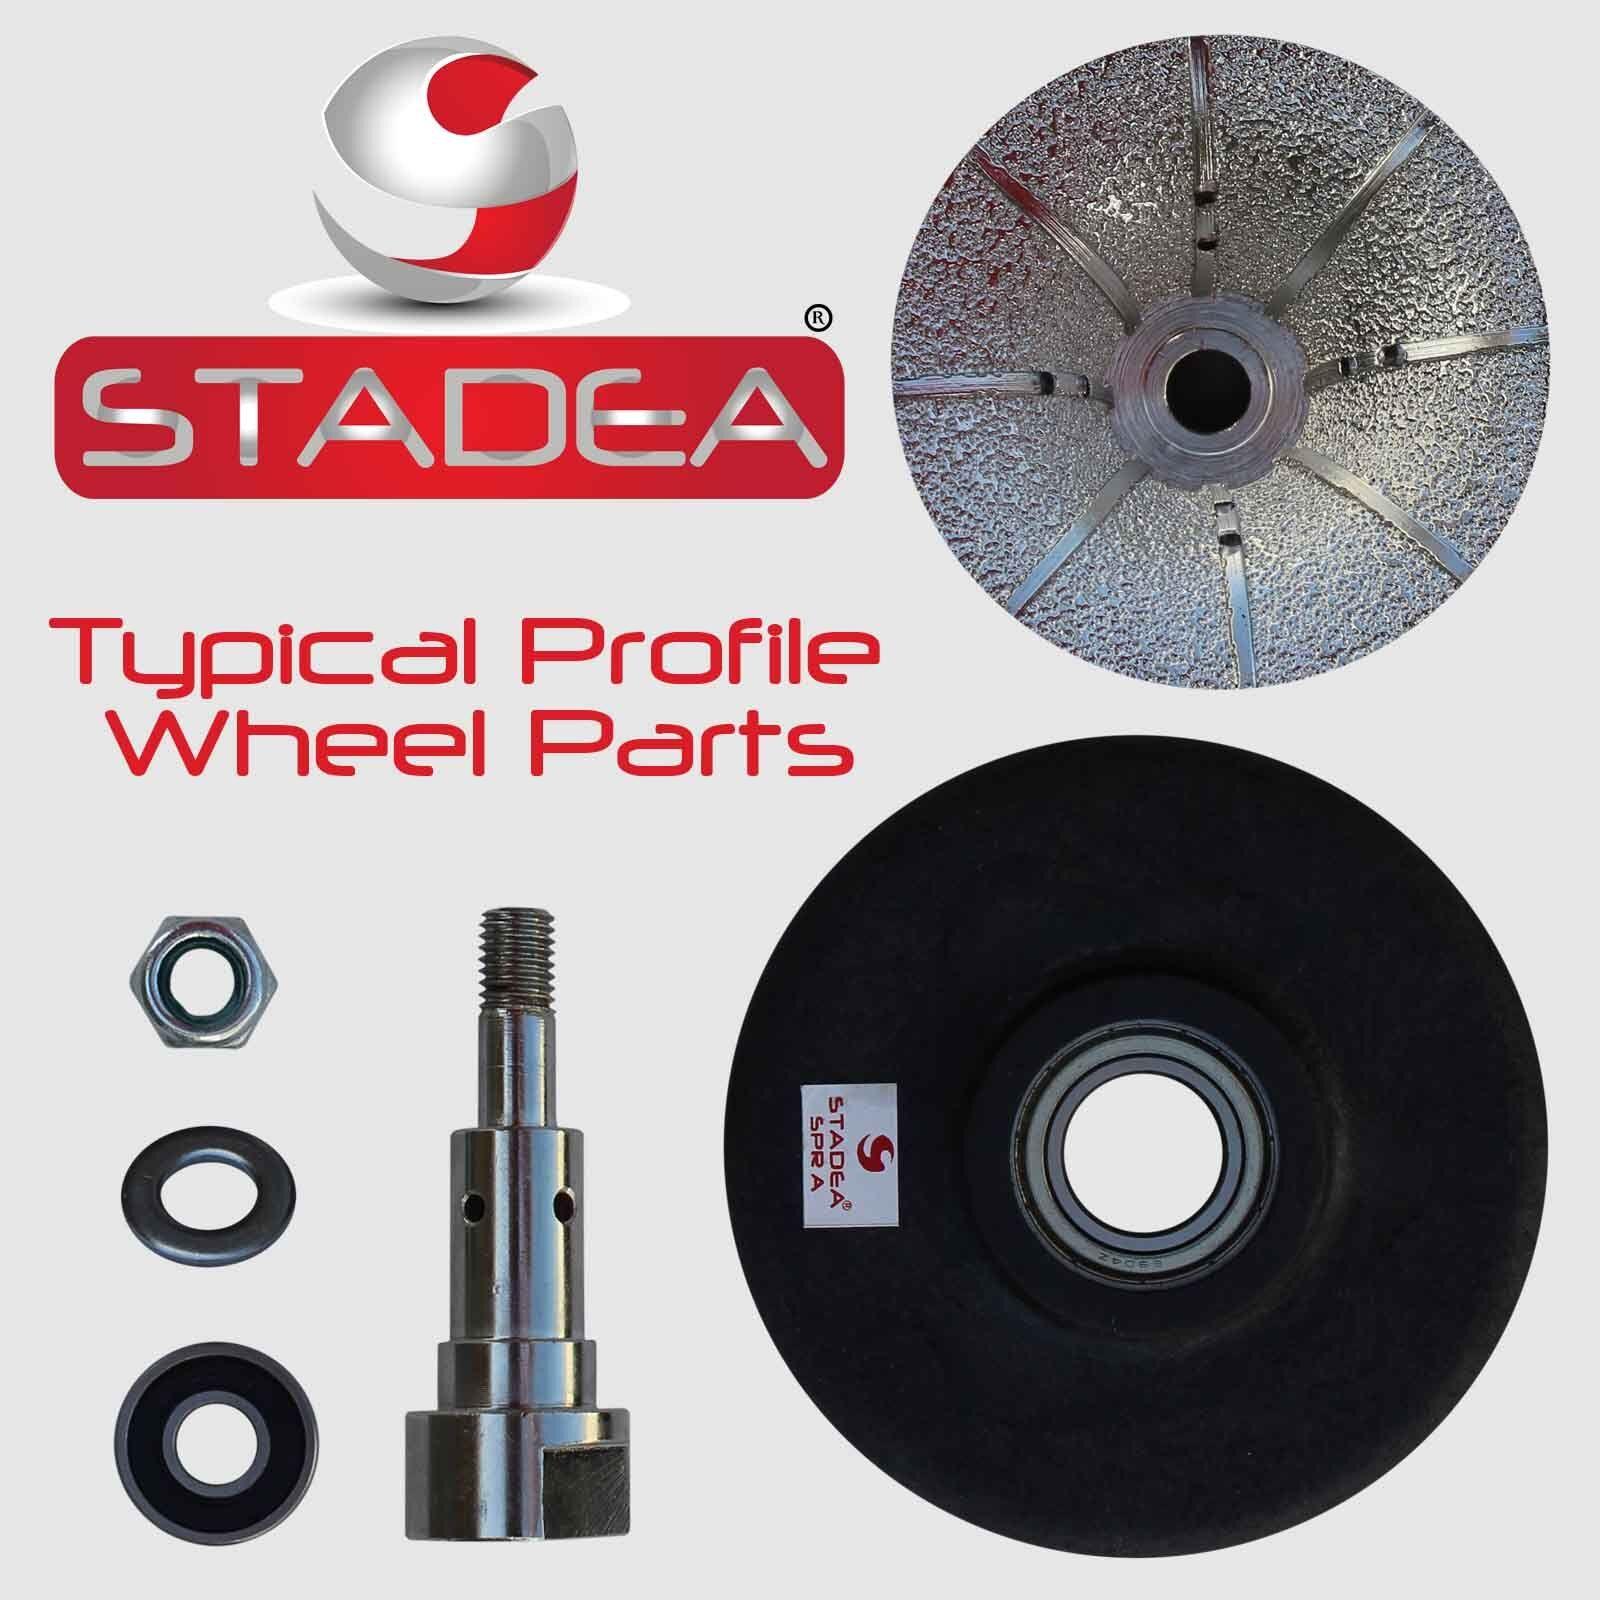 Stadea Diamond Profile Wheel Hand Bits 3 16 Quot Demi Radius